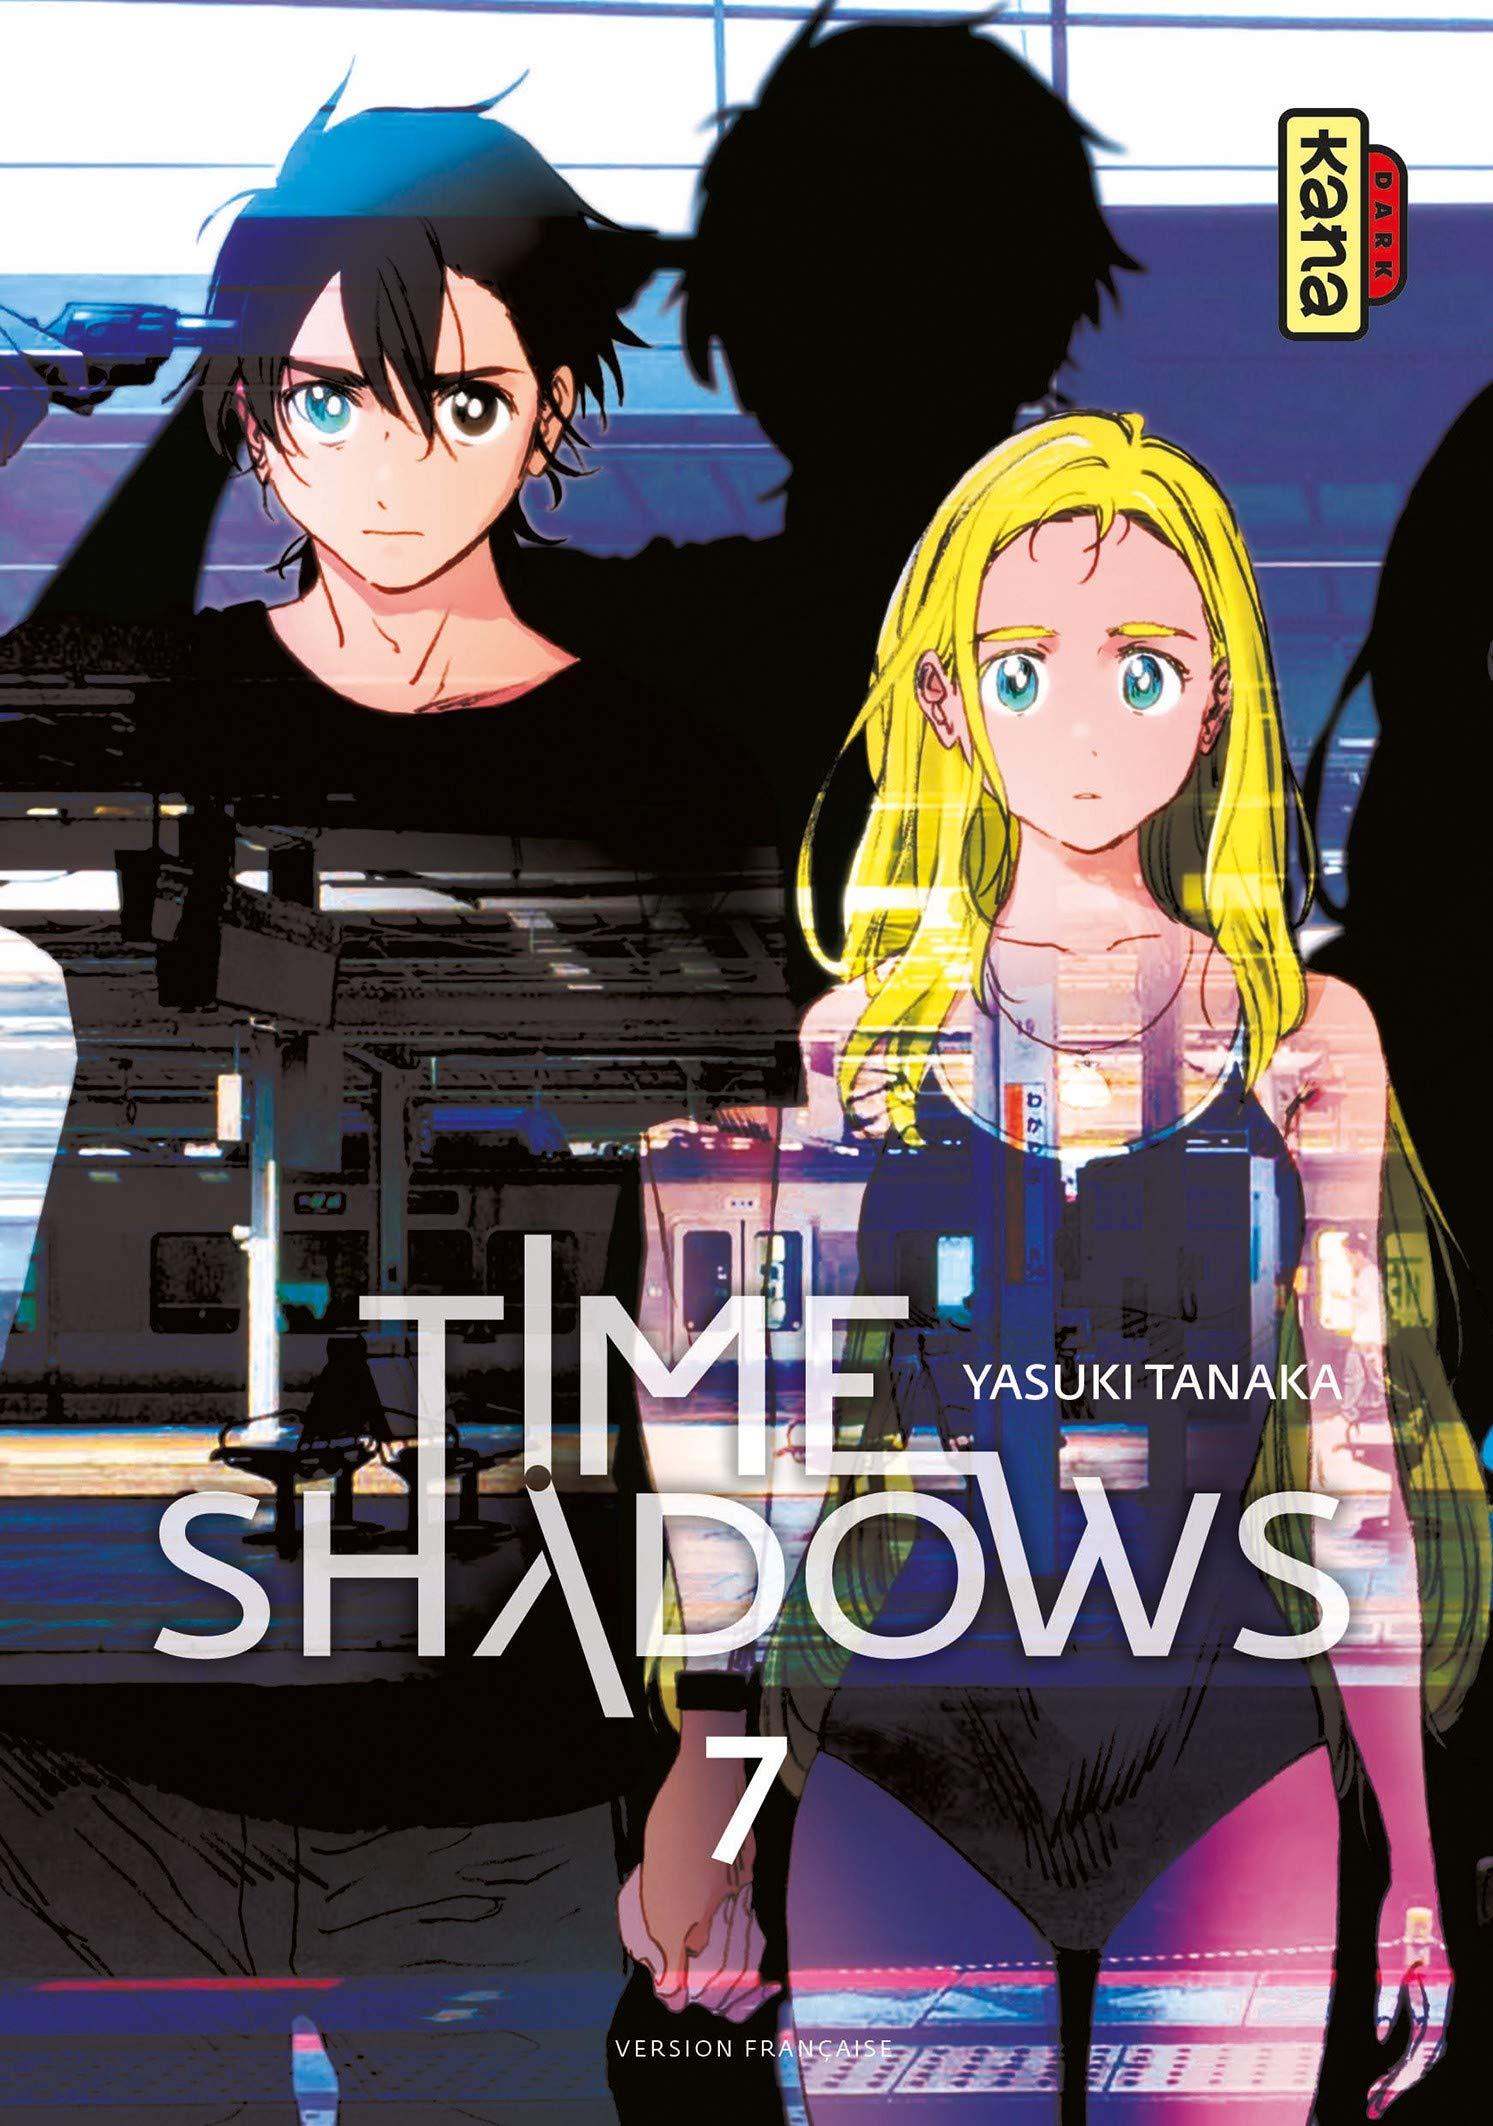 Time Shadows 7